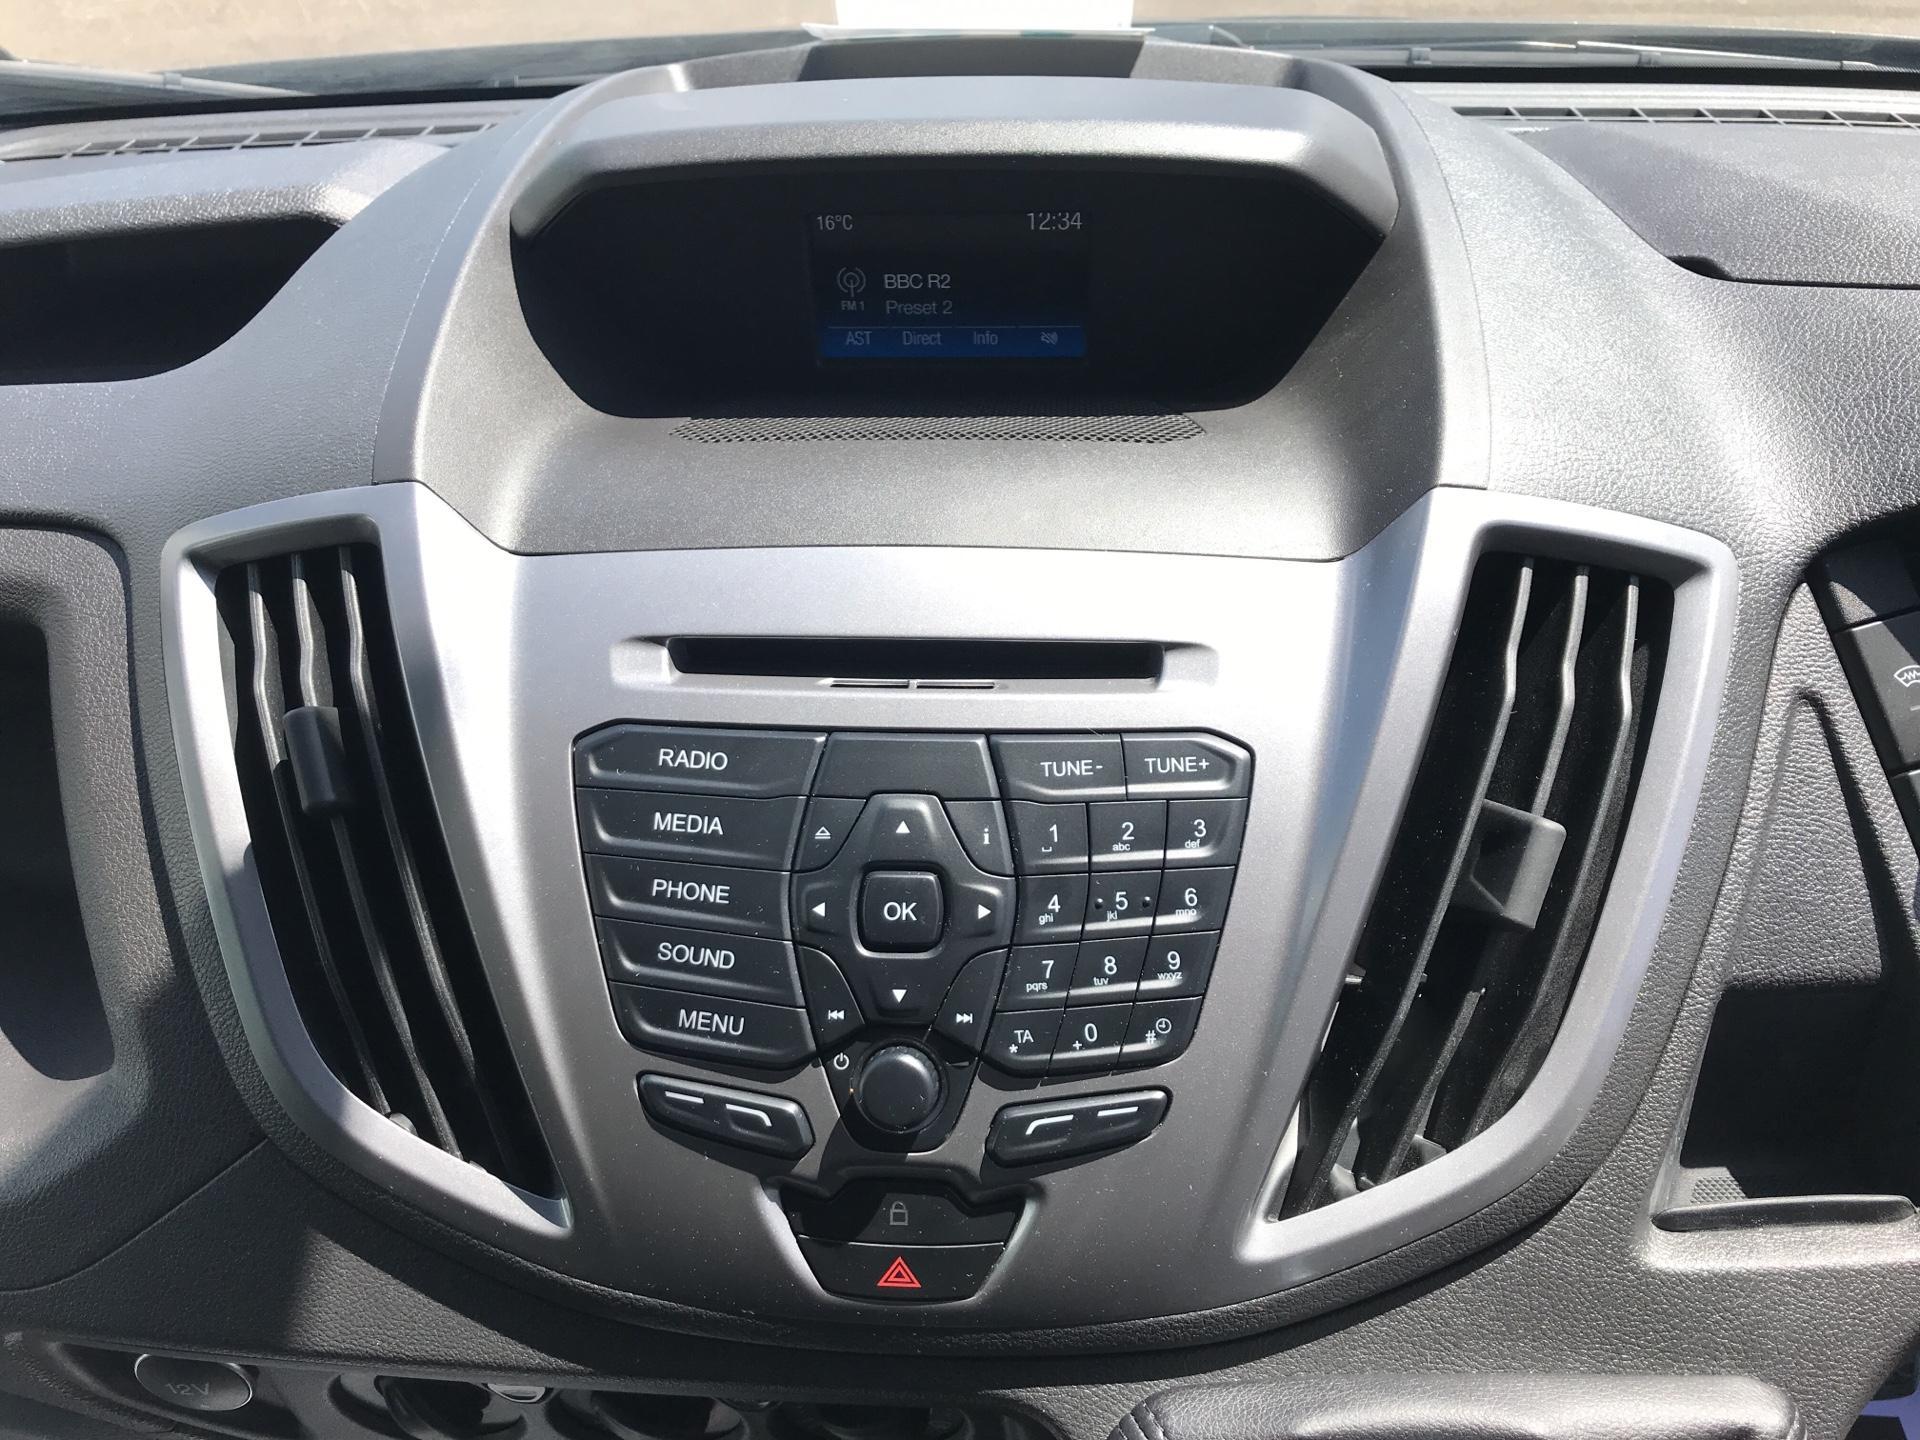 2018 Ford Transit 2.0 Tdci 130Ps H2 D/Cab Crew Van Euro 6 (WU68PXA) Image 10